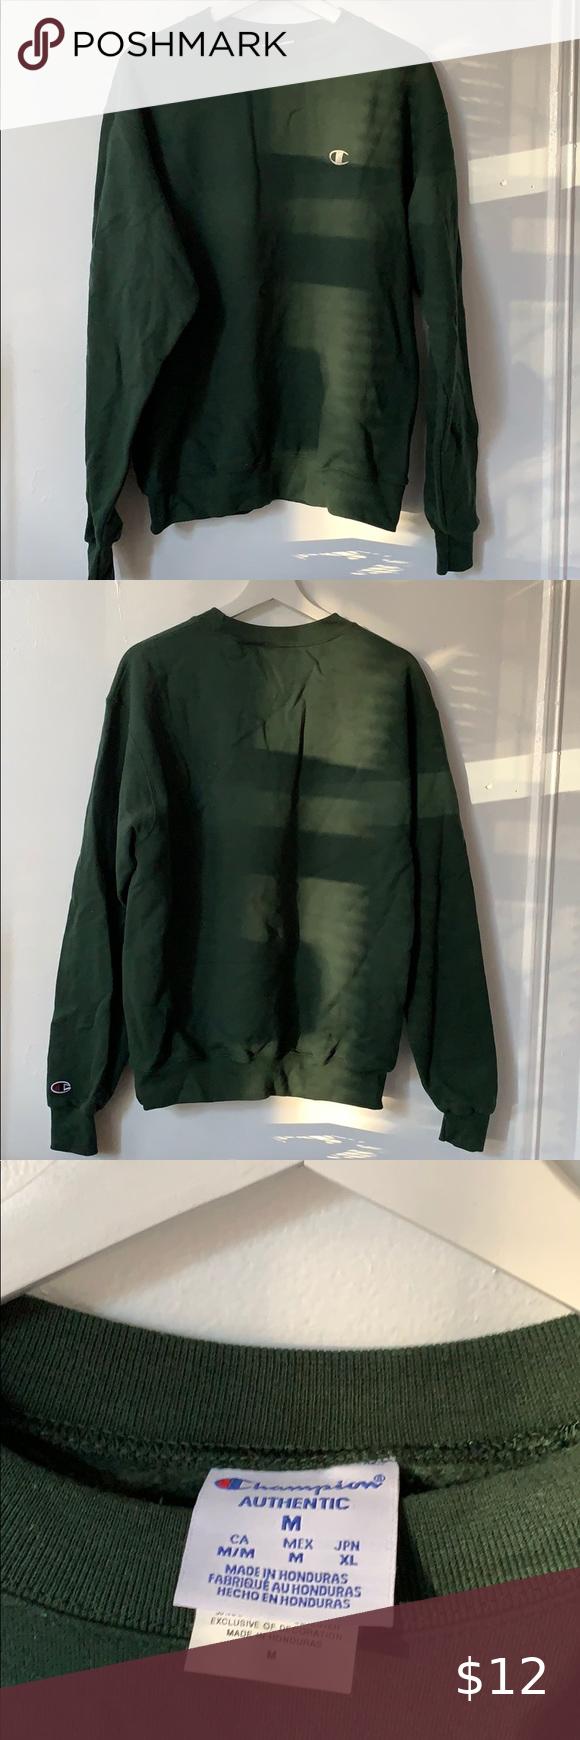 Green Champion Sweatshirt Champion Sweatshirt Green Champion Sweatshirt Sweatshirts [ 1740 x 580 Pixel ]